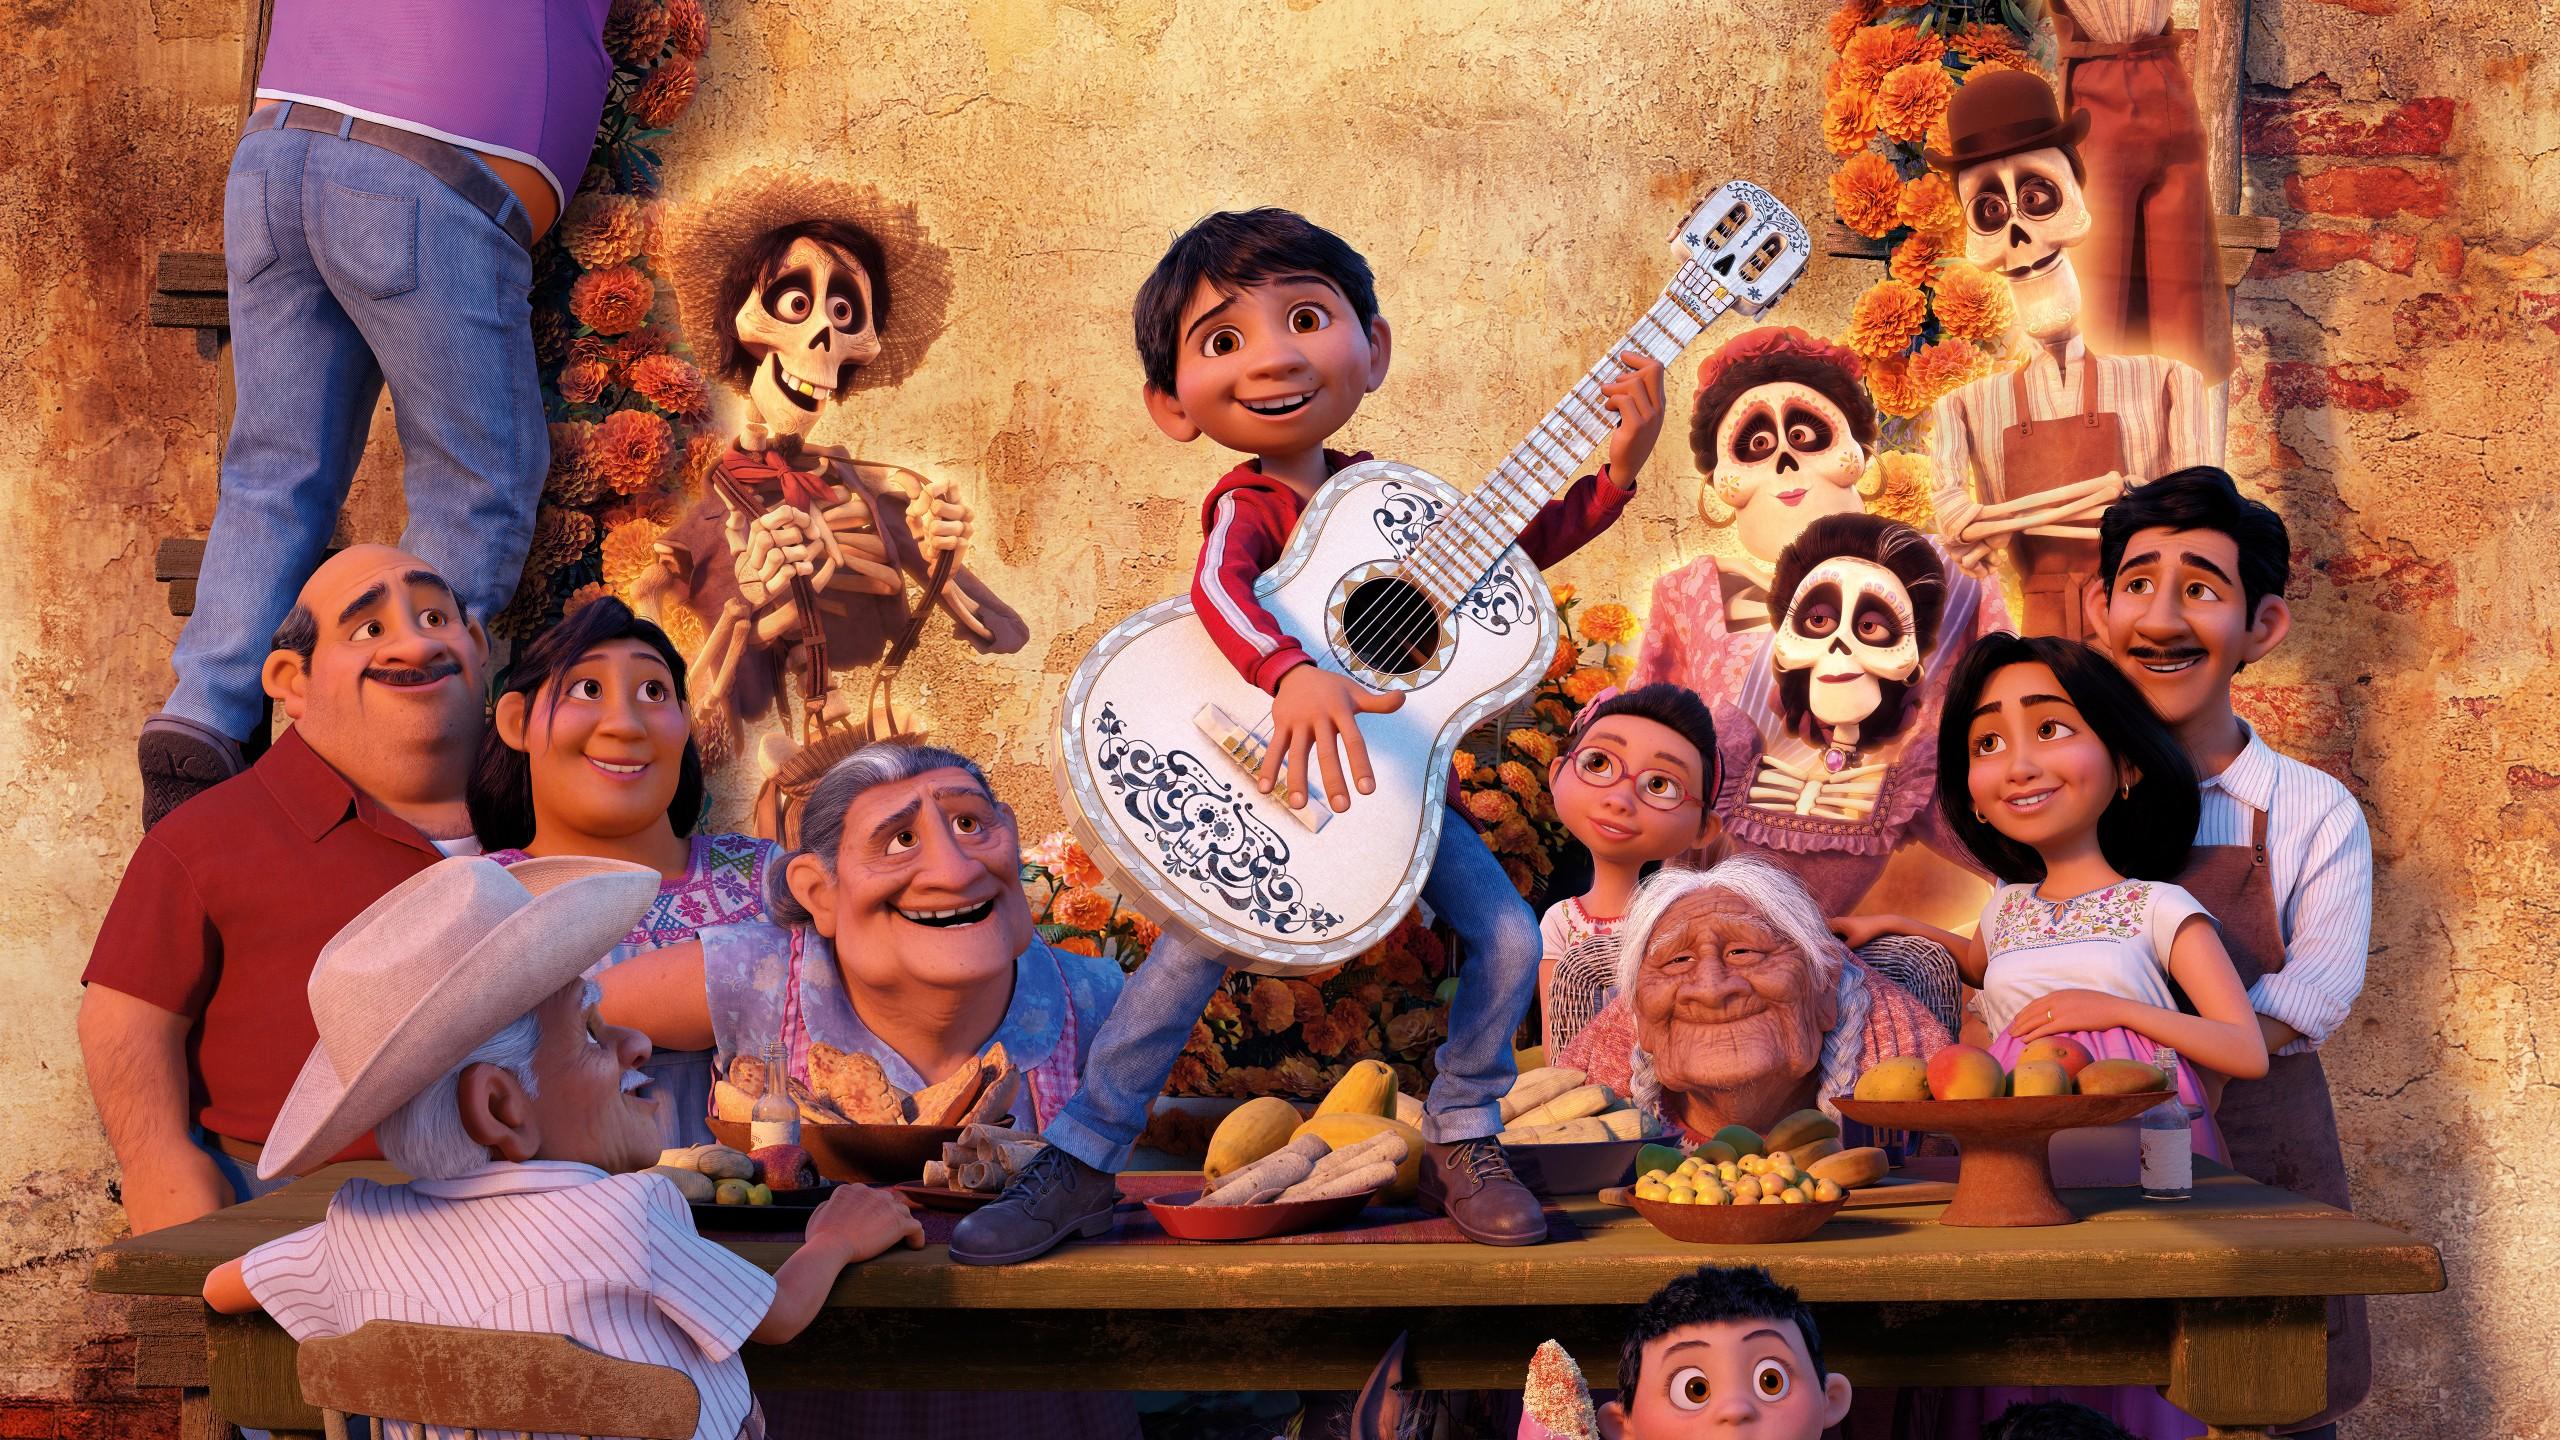 Wallpaper Coco Pixar Animation HD K Movies 2560x1440